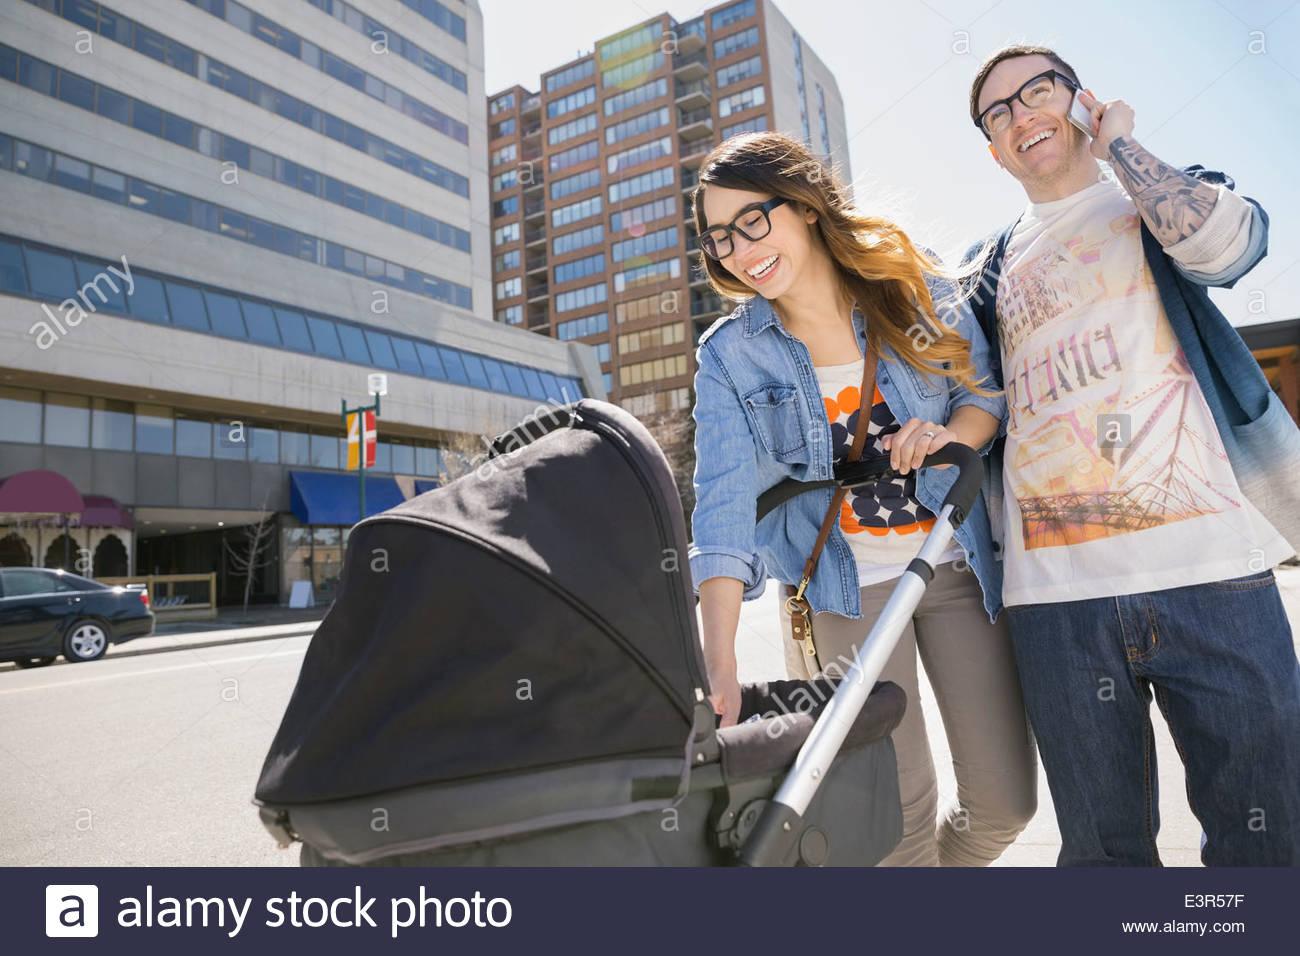 Hipster couple pushing stroller on sunny urban street - Stock Image